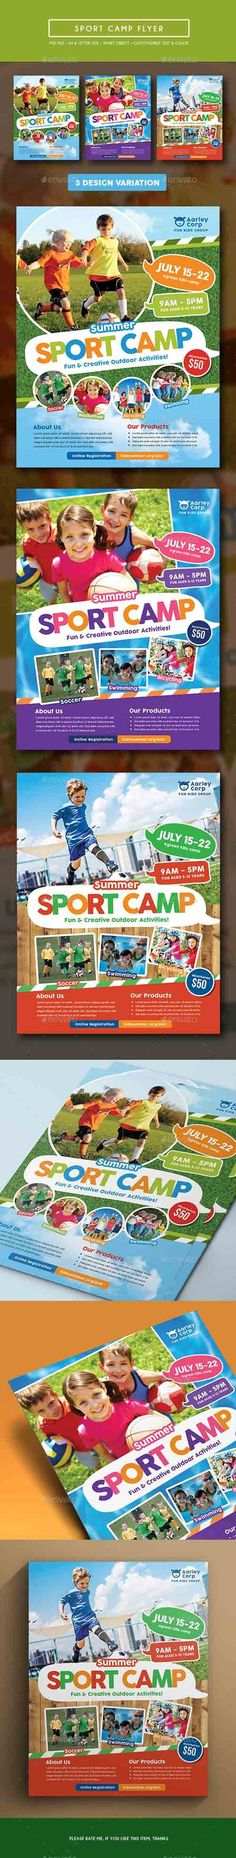 Sport Camp Flyer 15373514 » HeroGFX Graphic Design